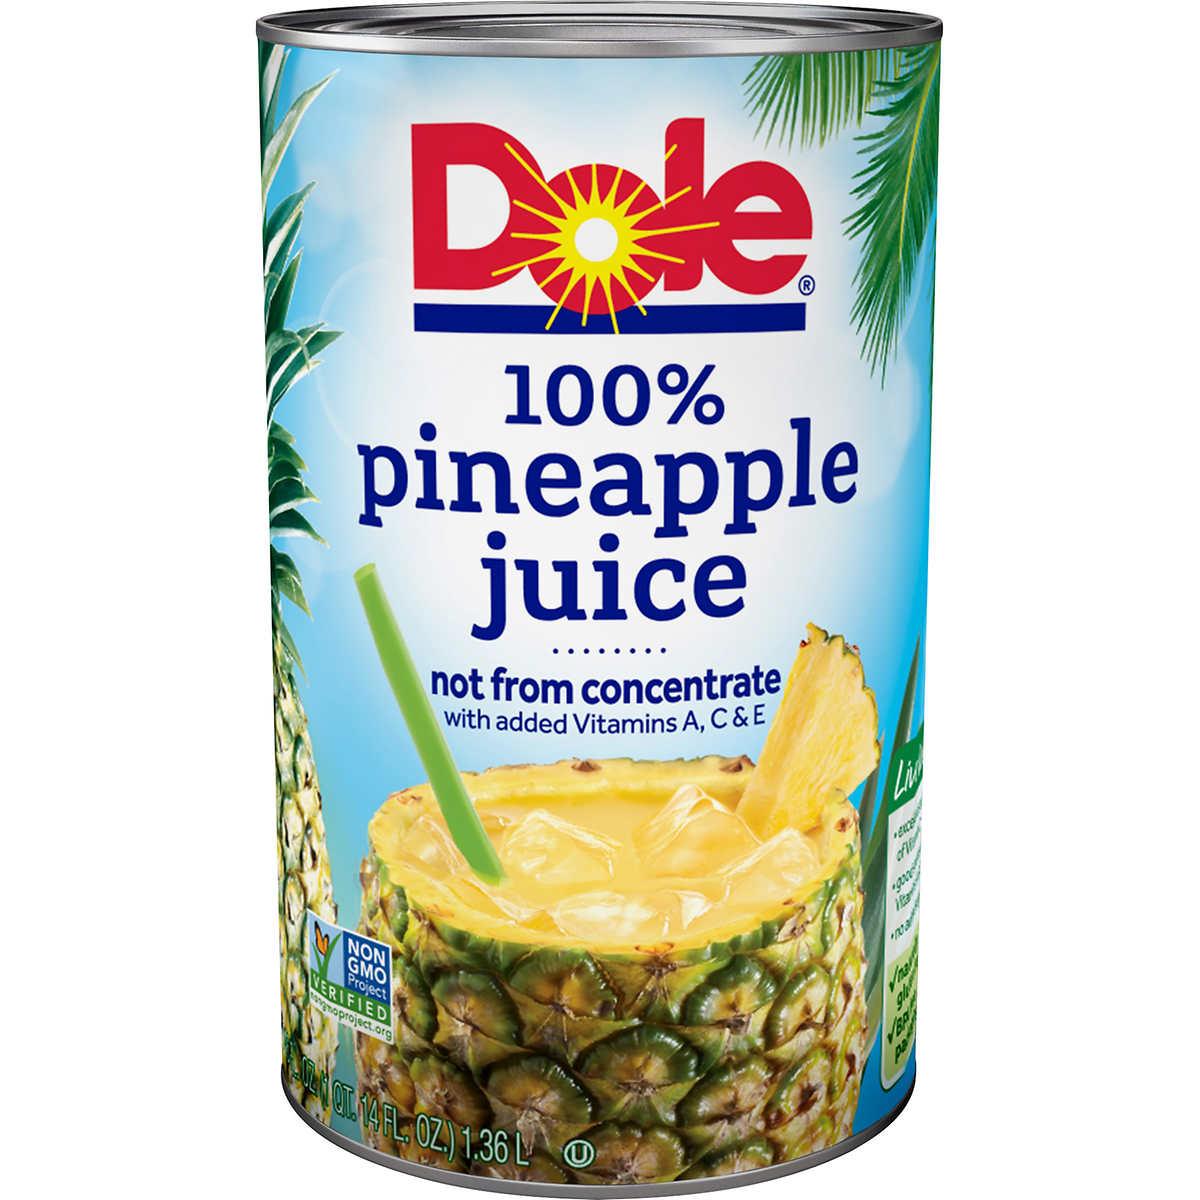 Dole 100% Pineapple Juice, 46 oz, 3 ct